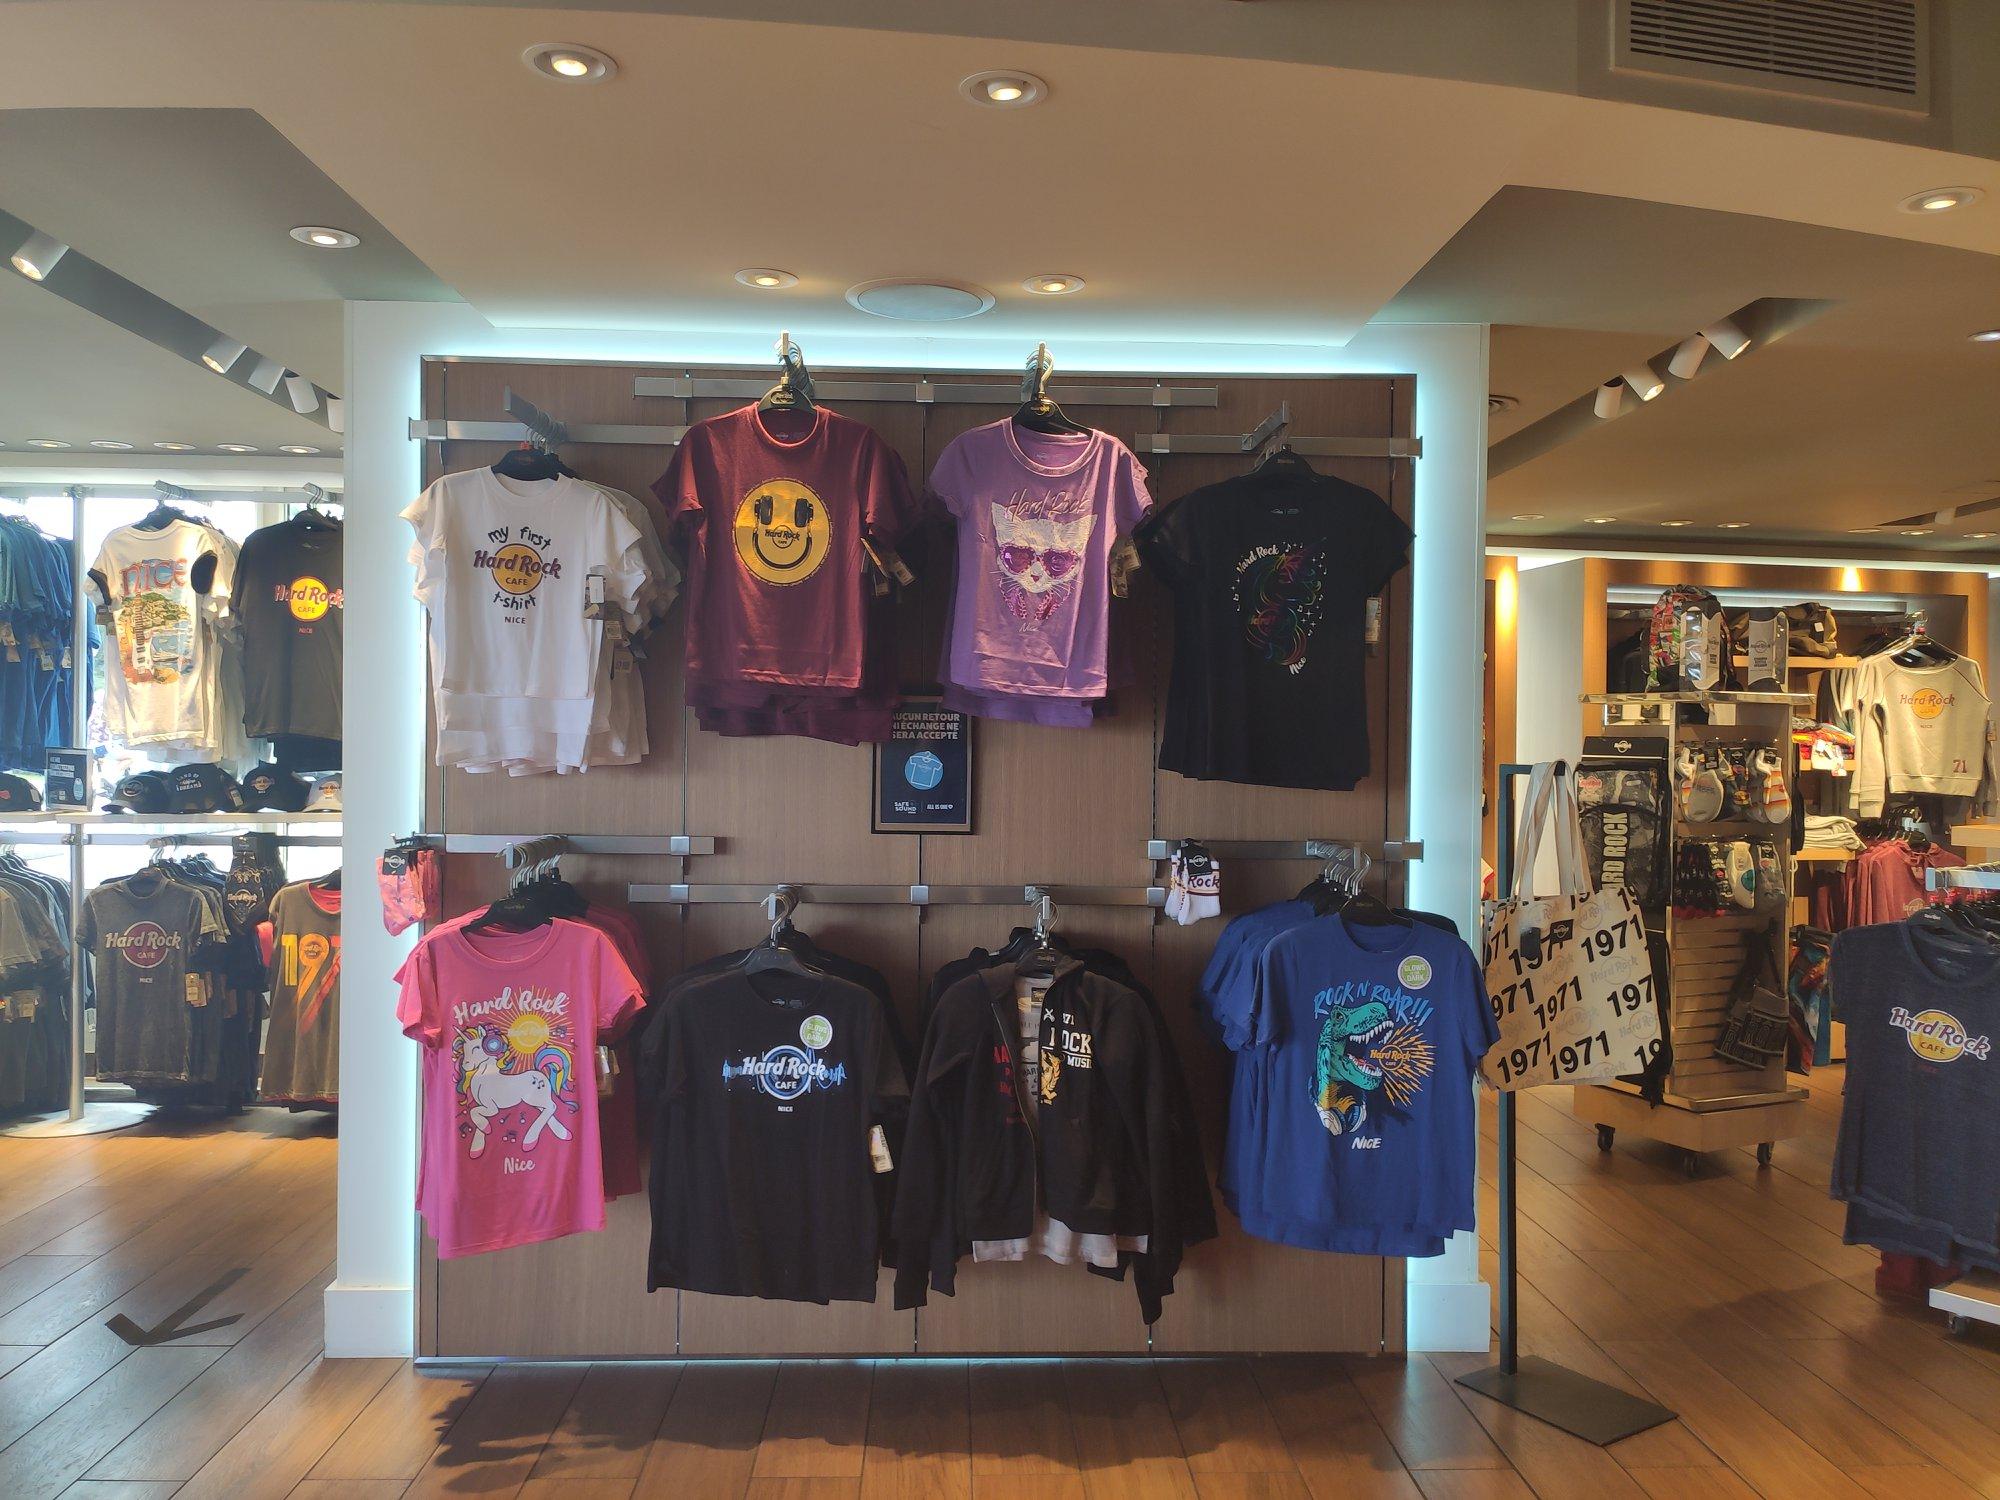 Hard Rock Cafe Nice - Nouveau shop